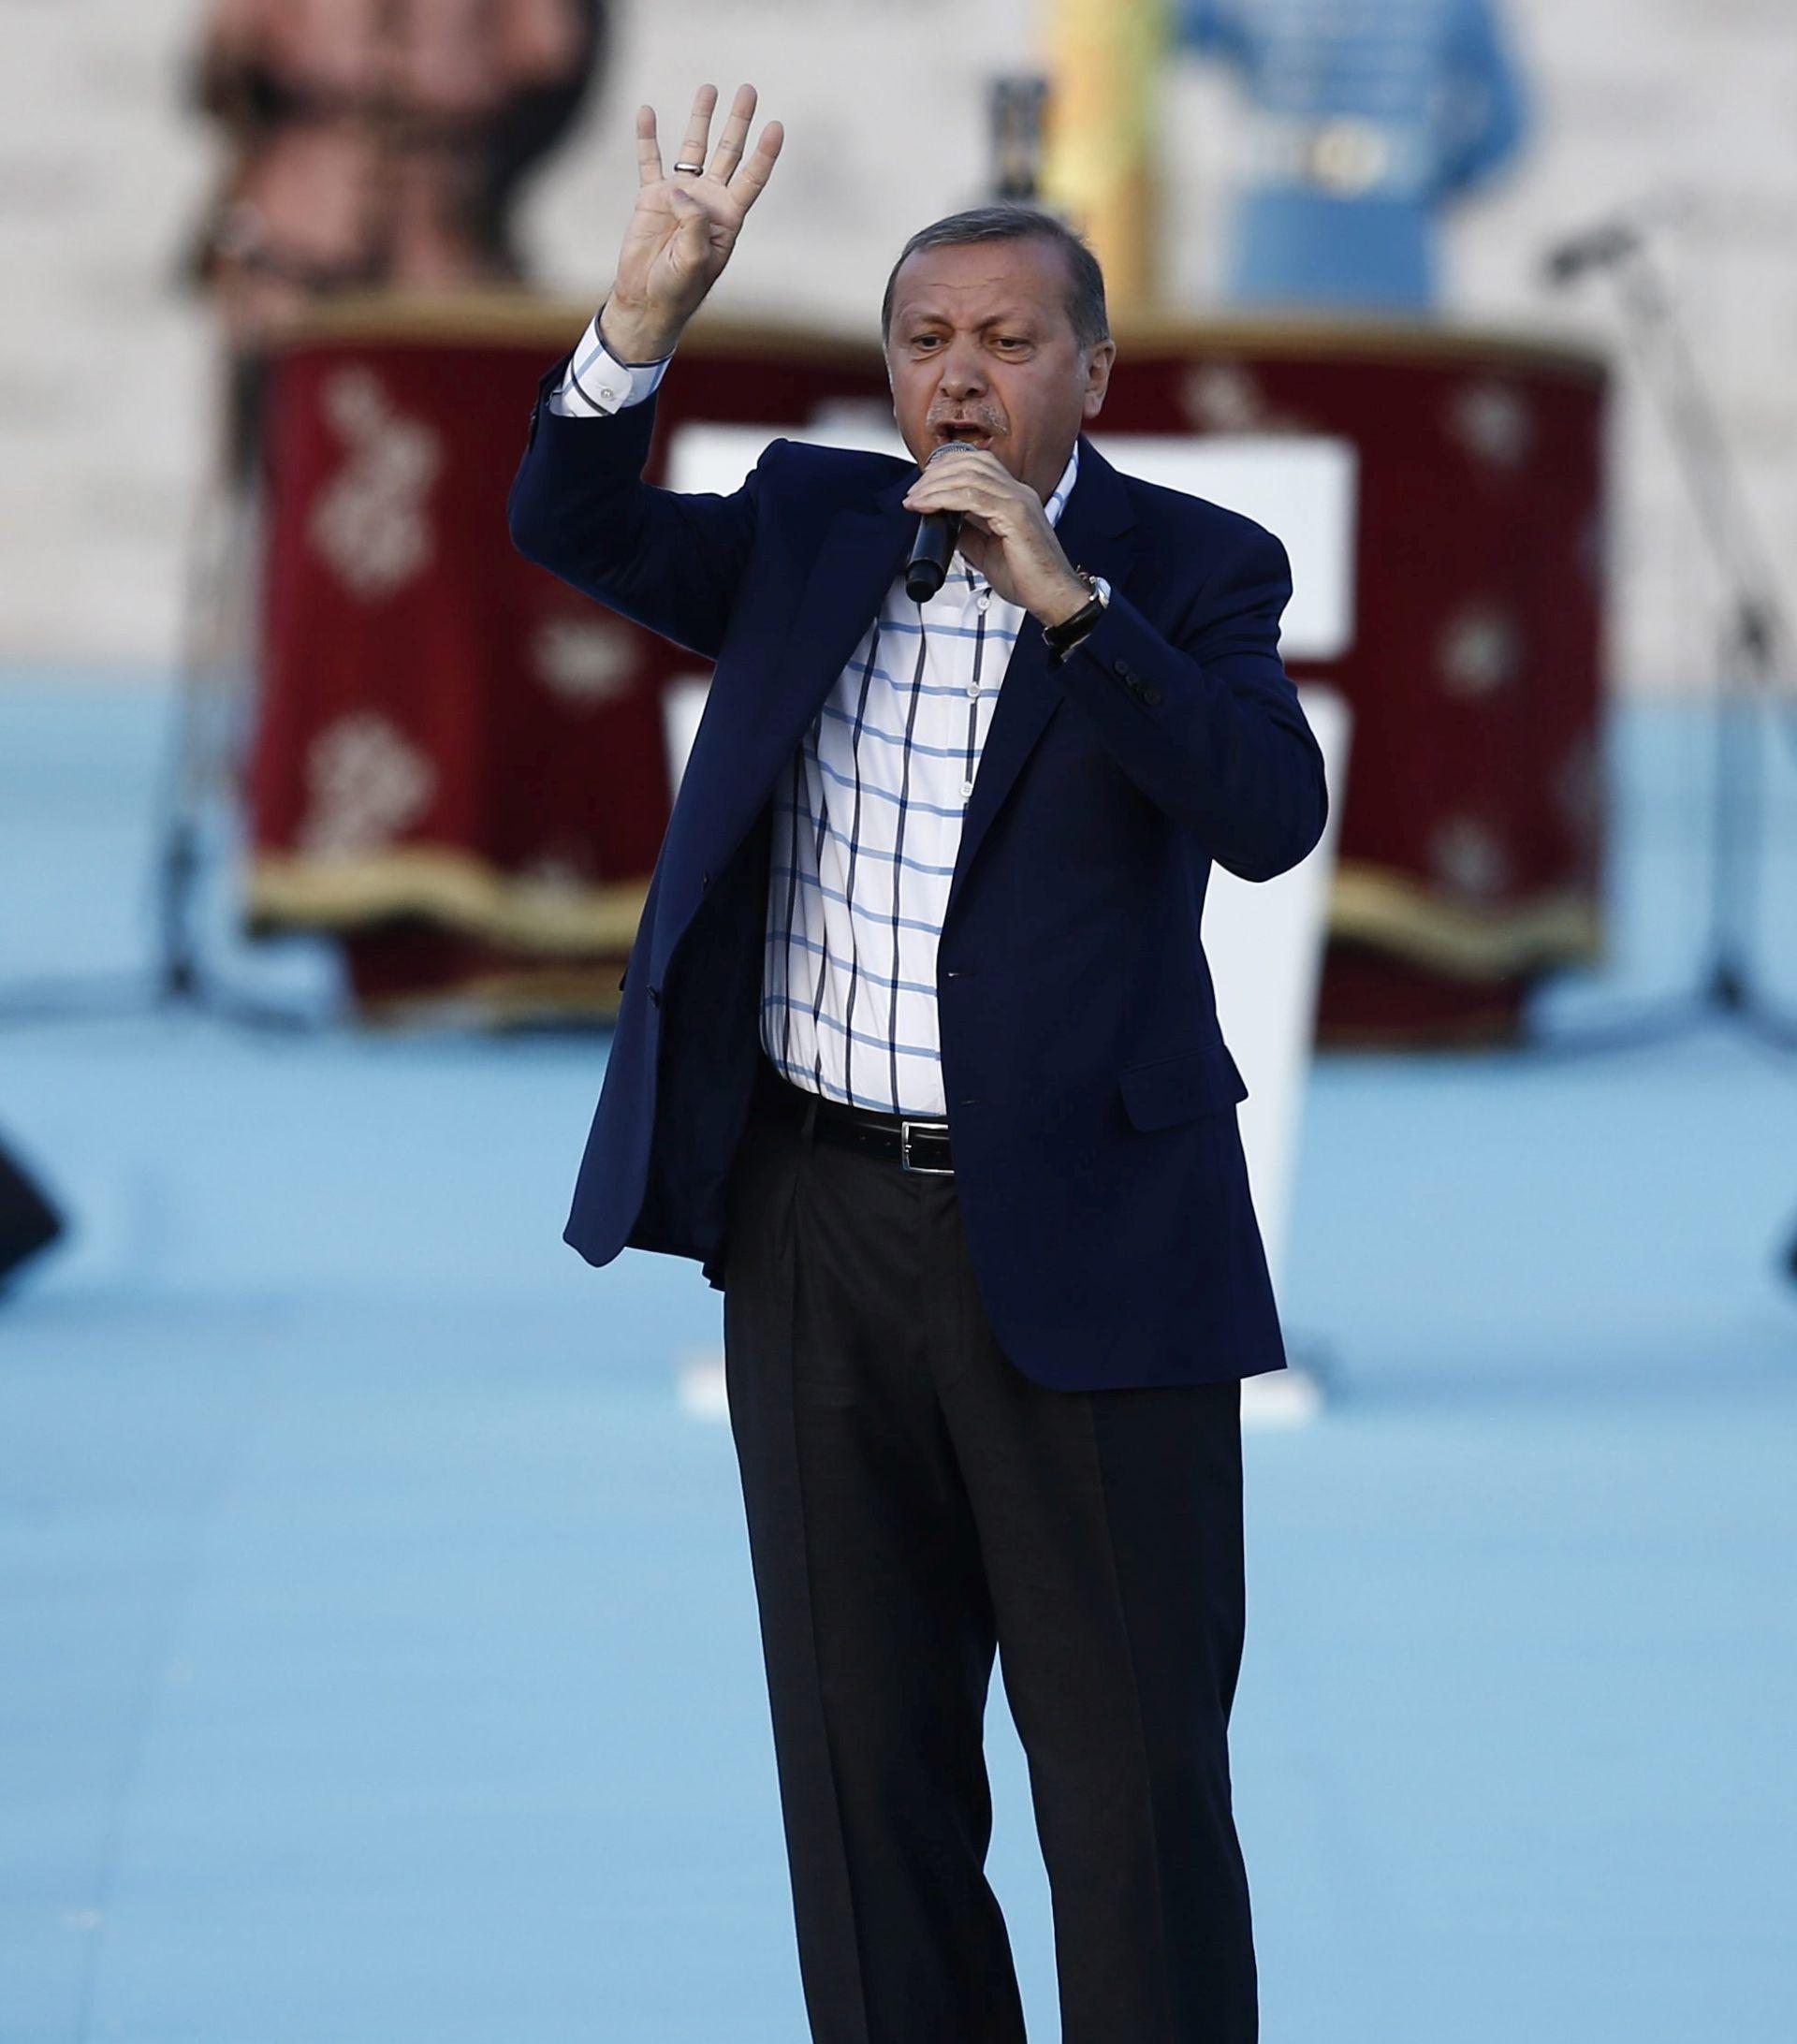 USVAJANJE REZOLUCIJE: Erdogan upozorava Njemačku da ne prizna armenski genocid